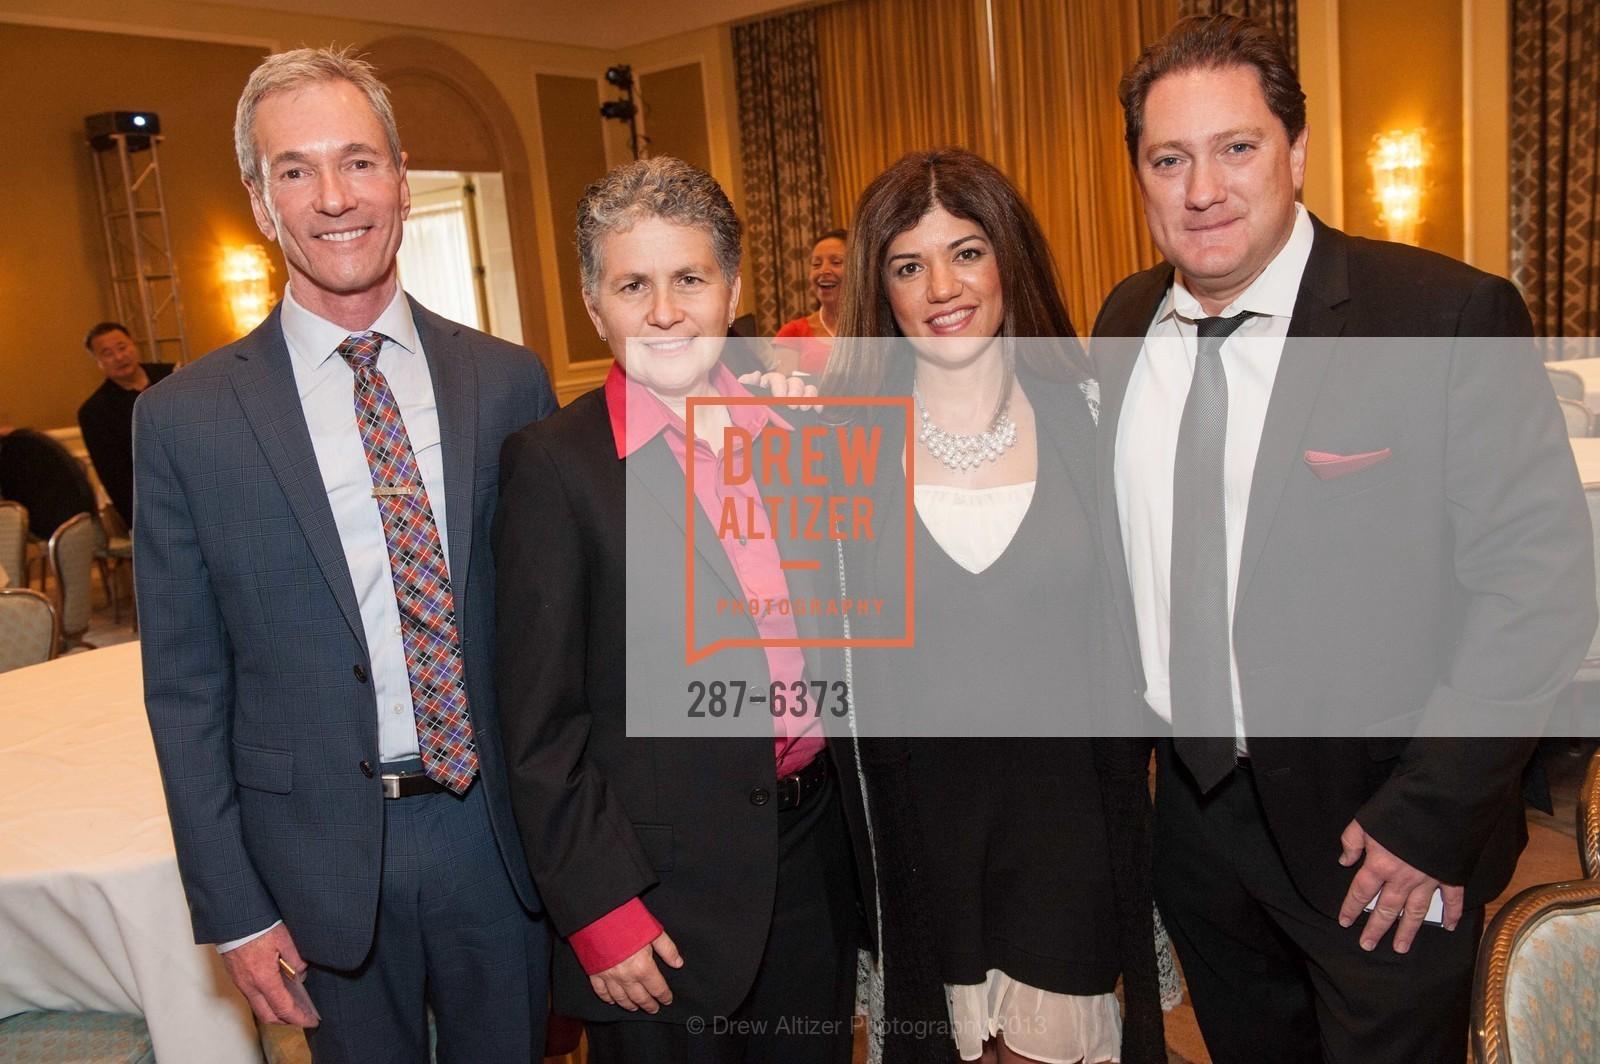 Jeff Schindler, Vitka Eisen, Shabnam Farneneh, Liam Mayclem, HEALTH RIGHT 360:  Be the Change 2013, US, November 8th, 2013